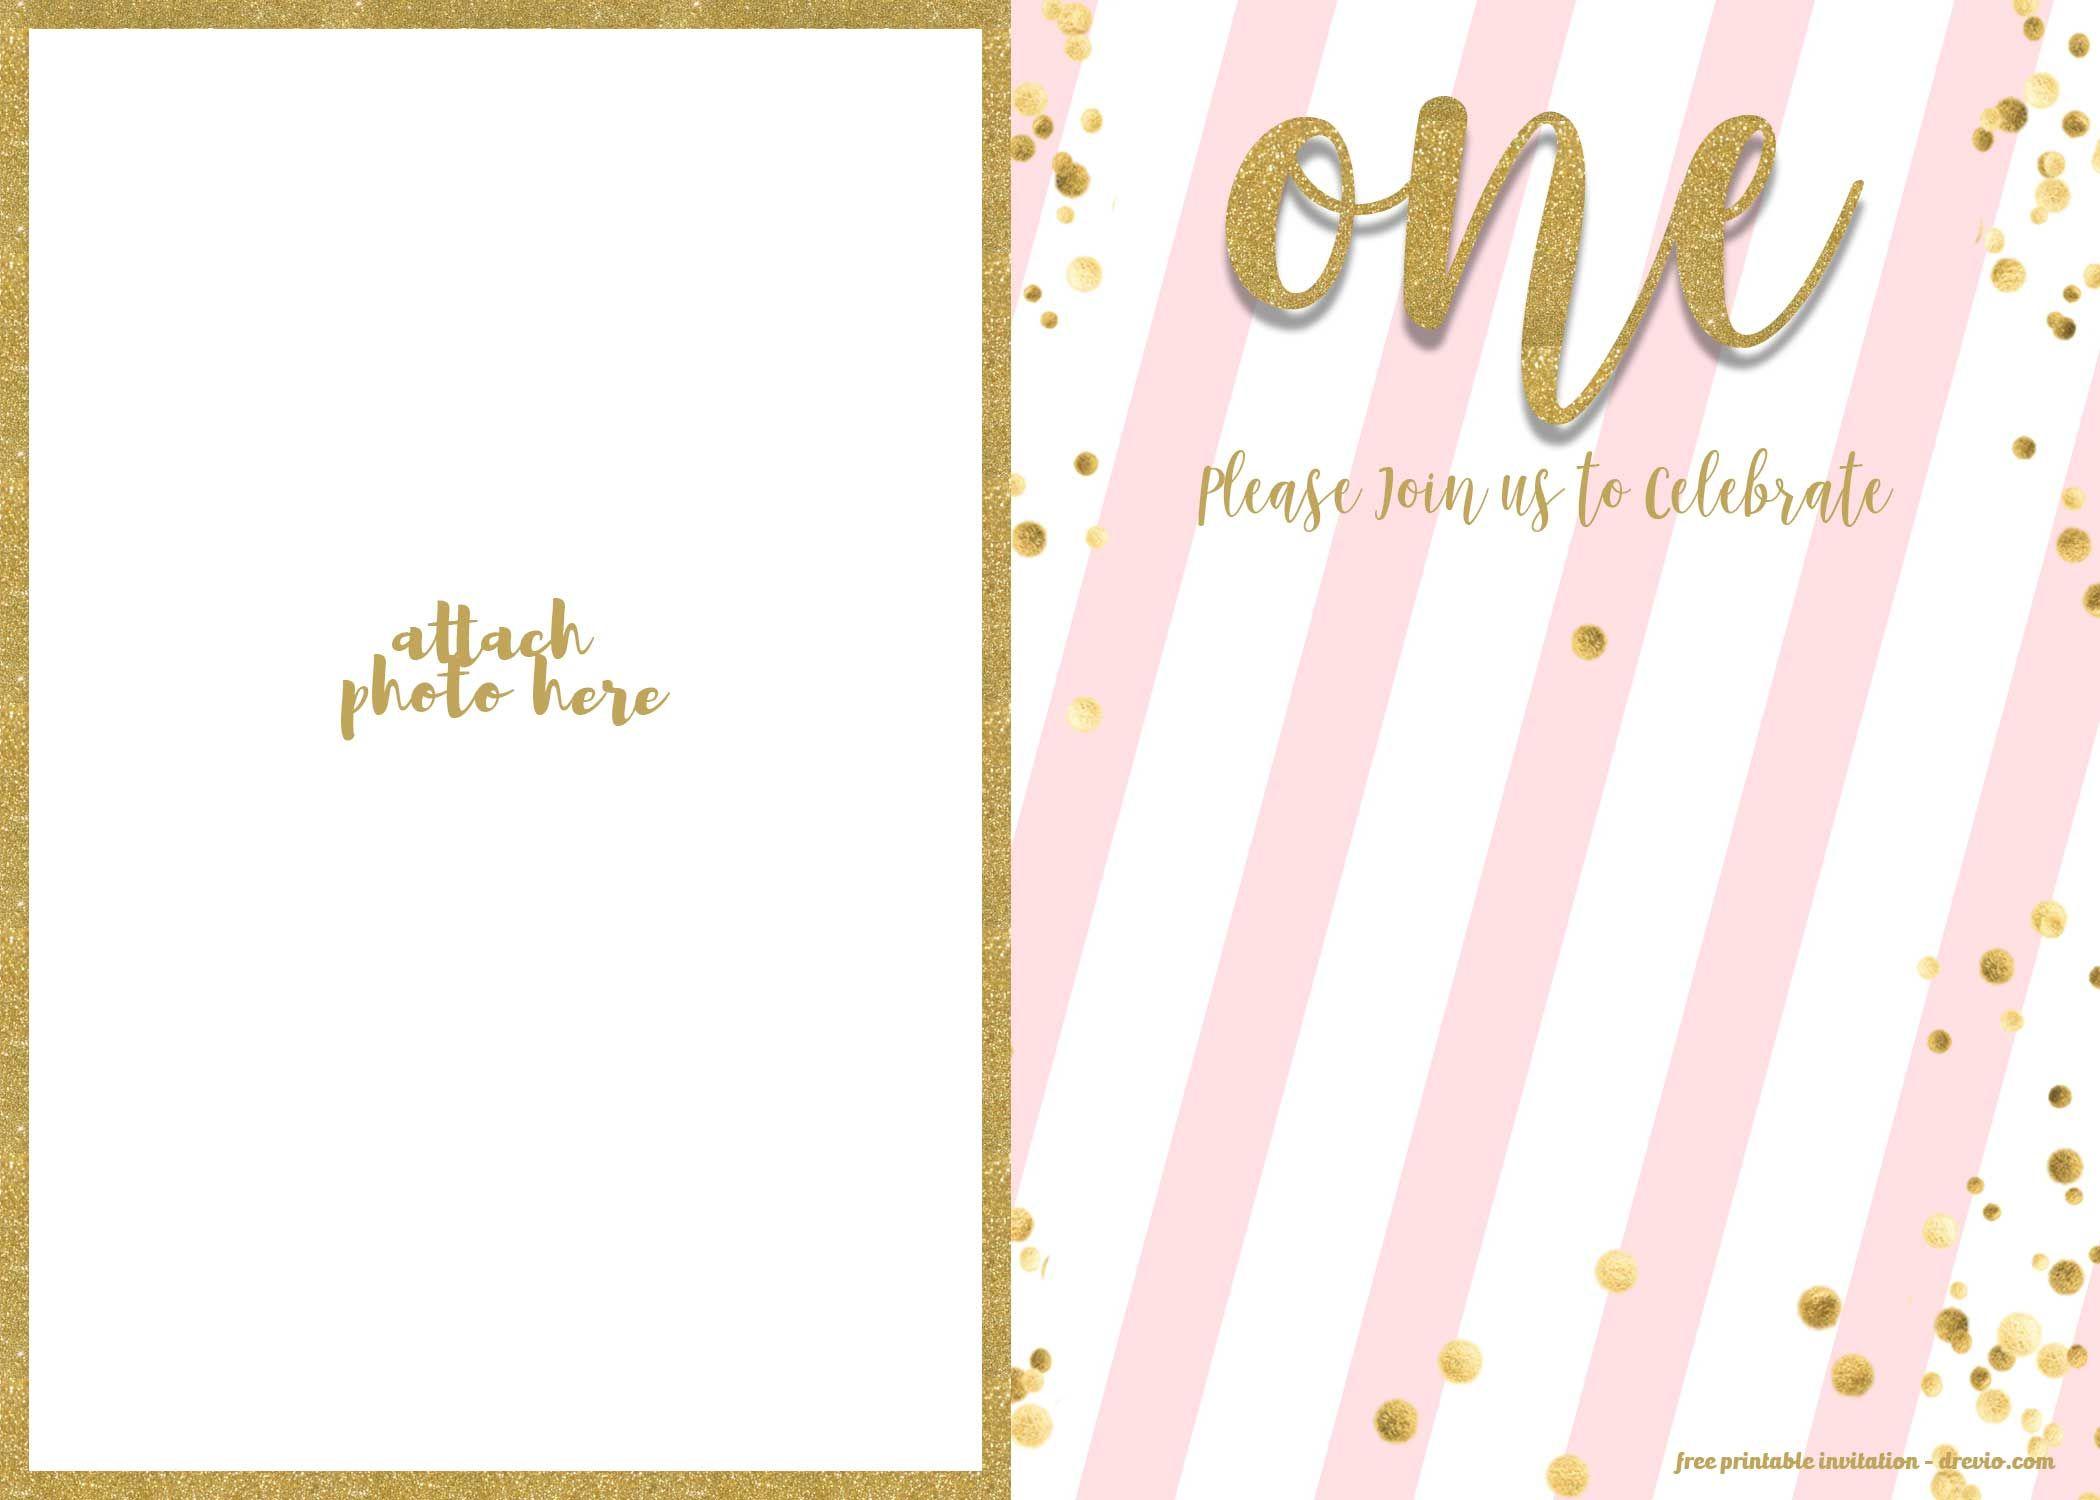 free 3st birthday invitations template for girl #PartyInvitation